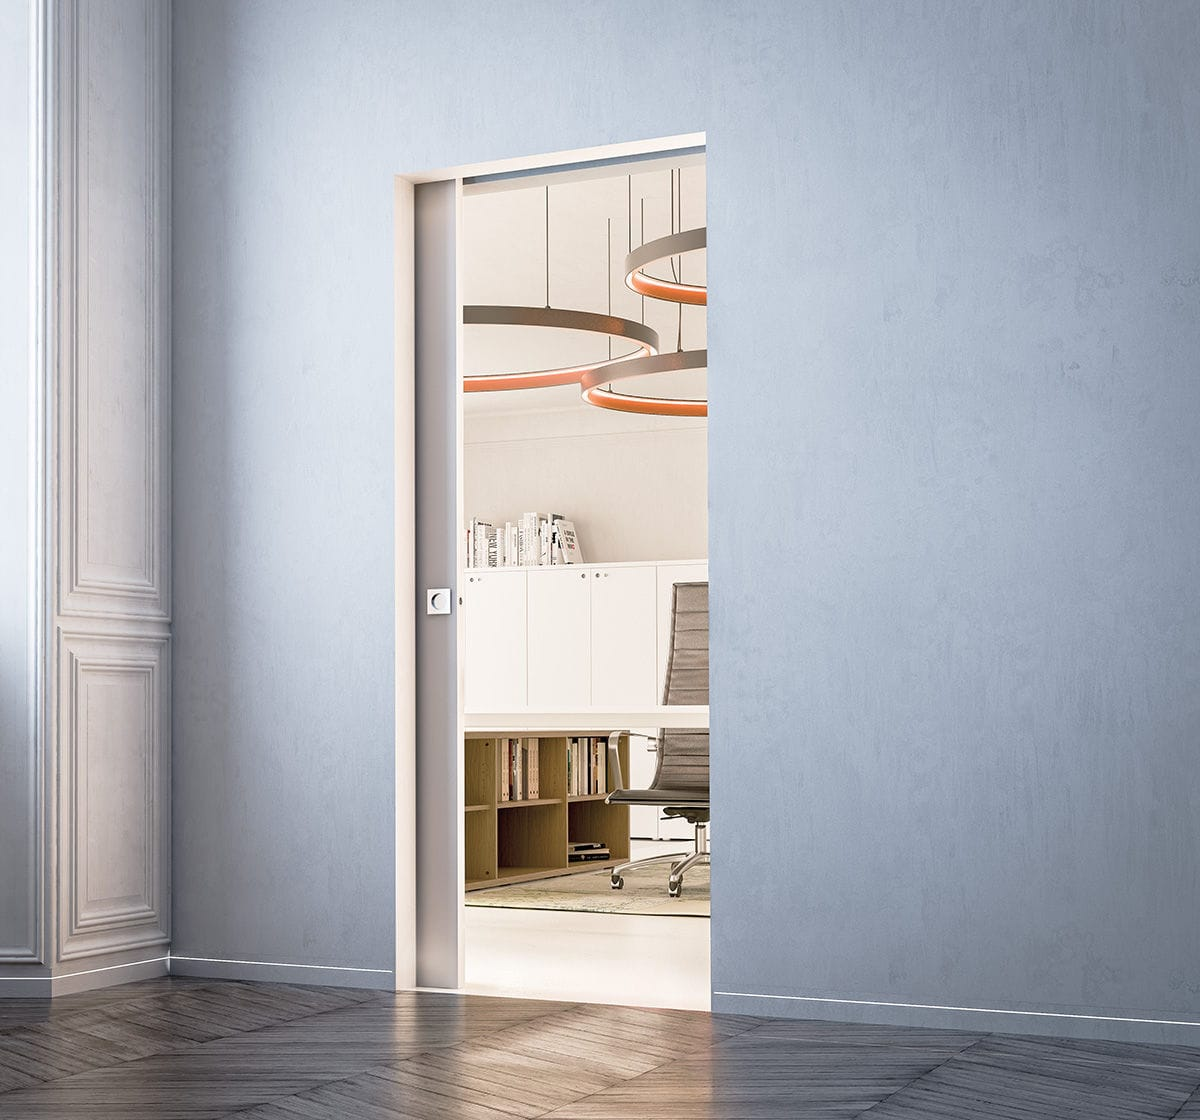 Porte Eclisse Syntesis Line.Sliding Door Pocket System Eclisse Syntesis Line Eclisse